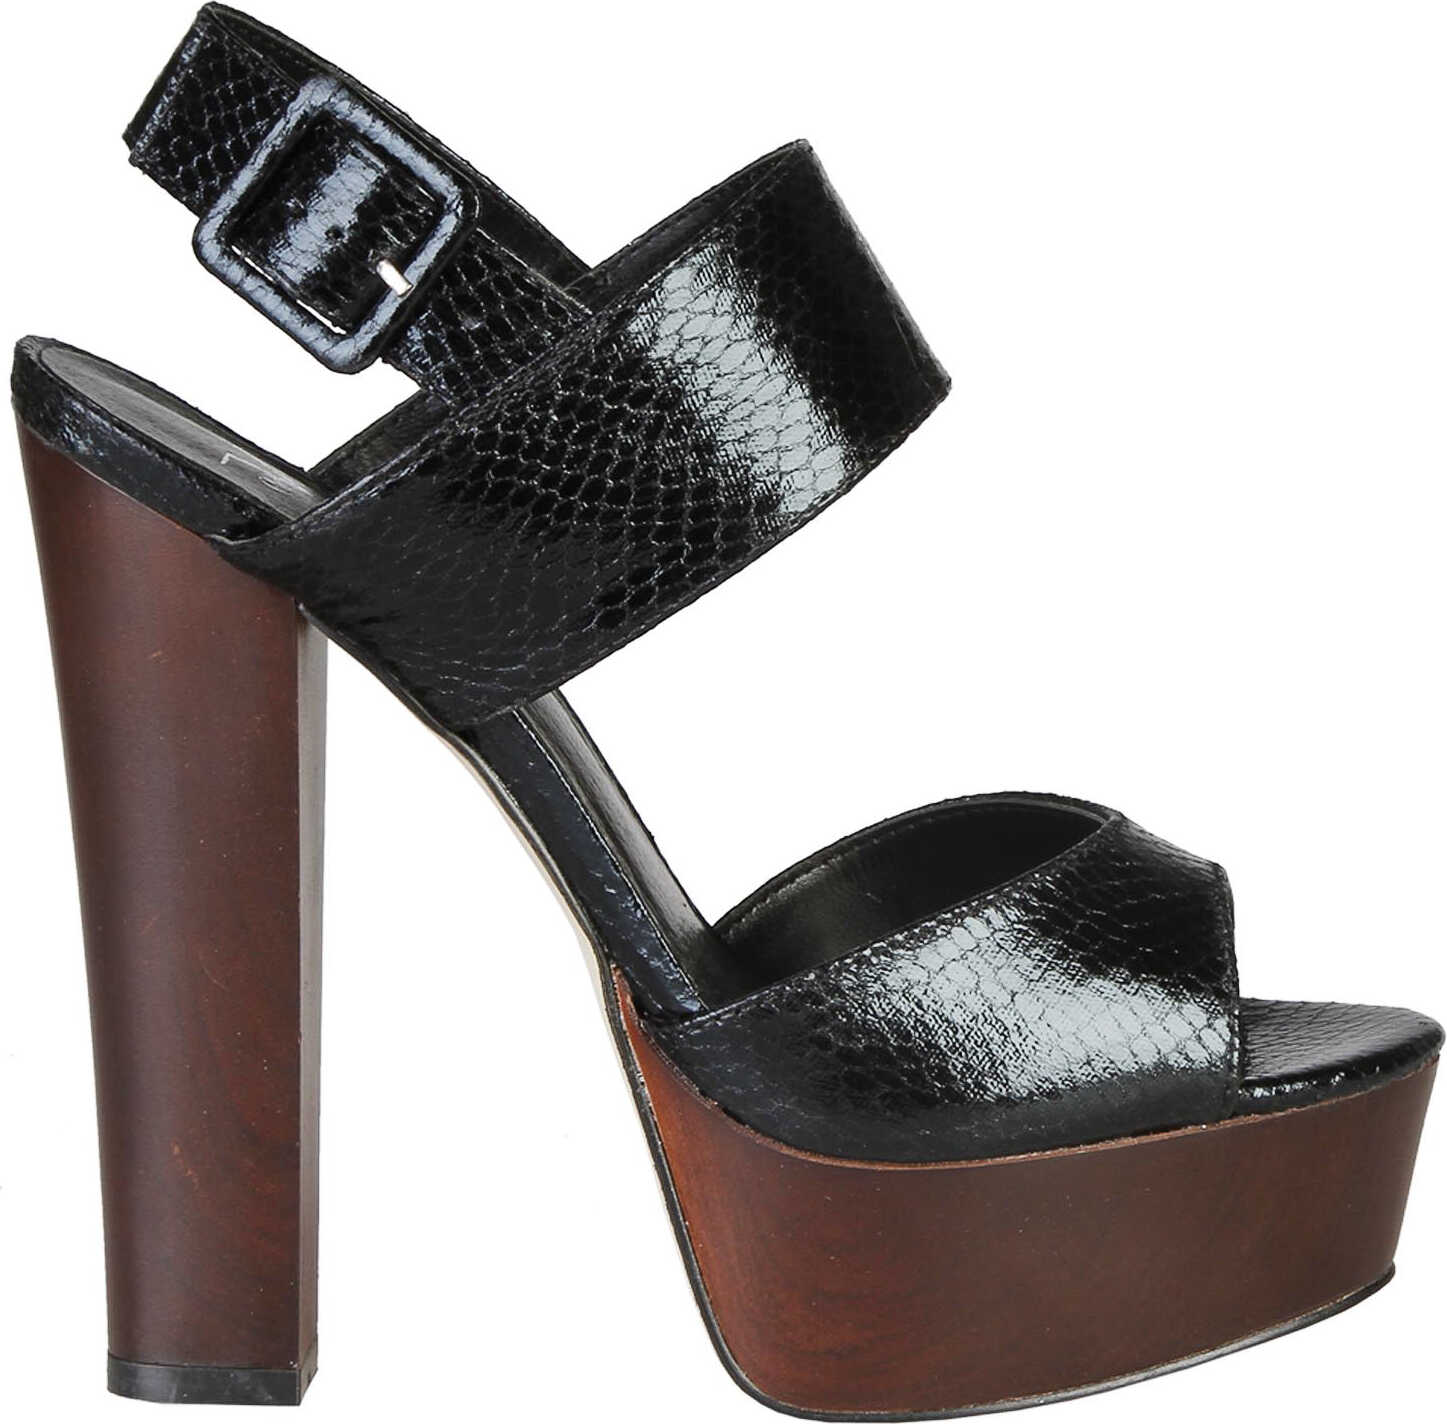 Sandale Femei Versace 1969 Celestine Black